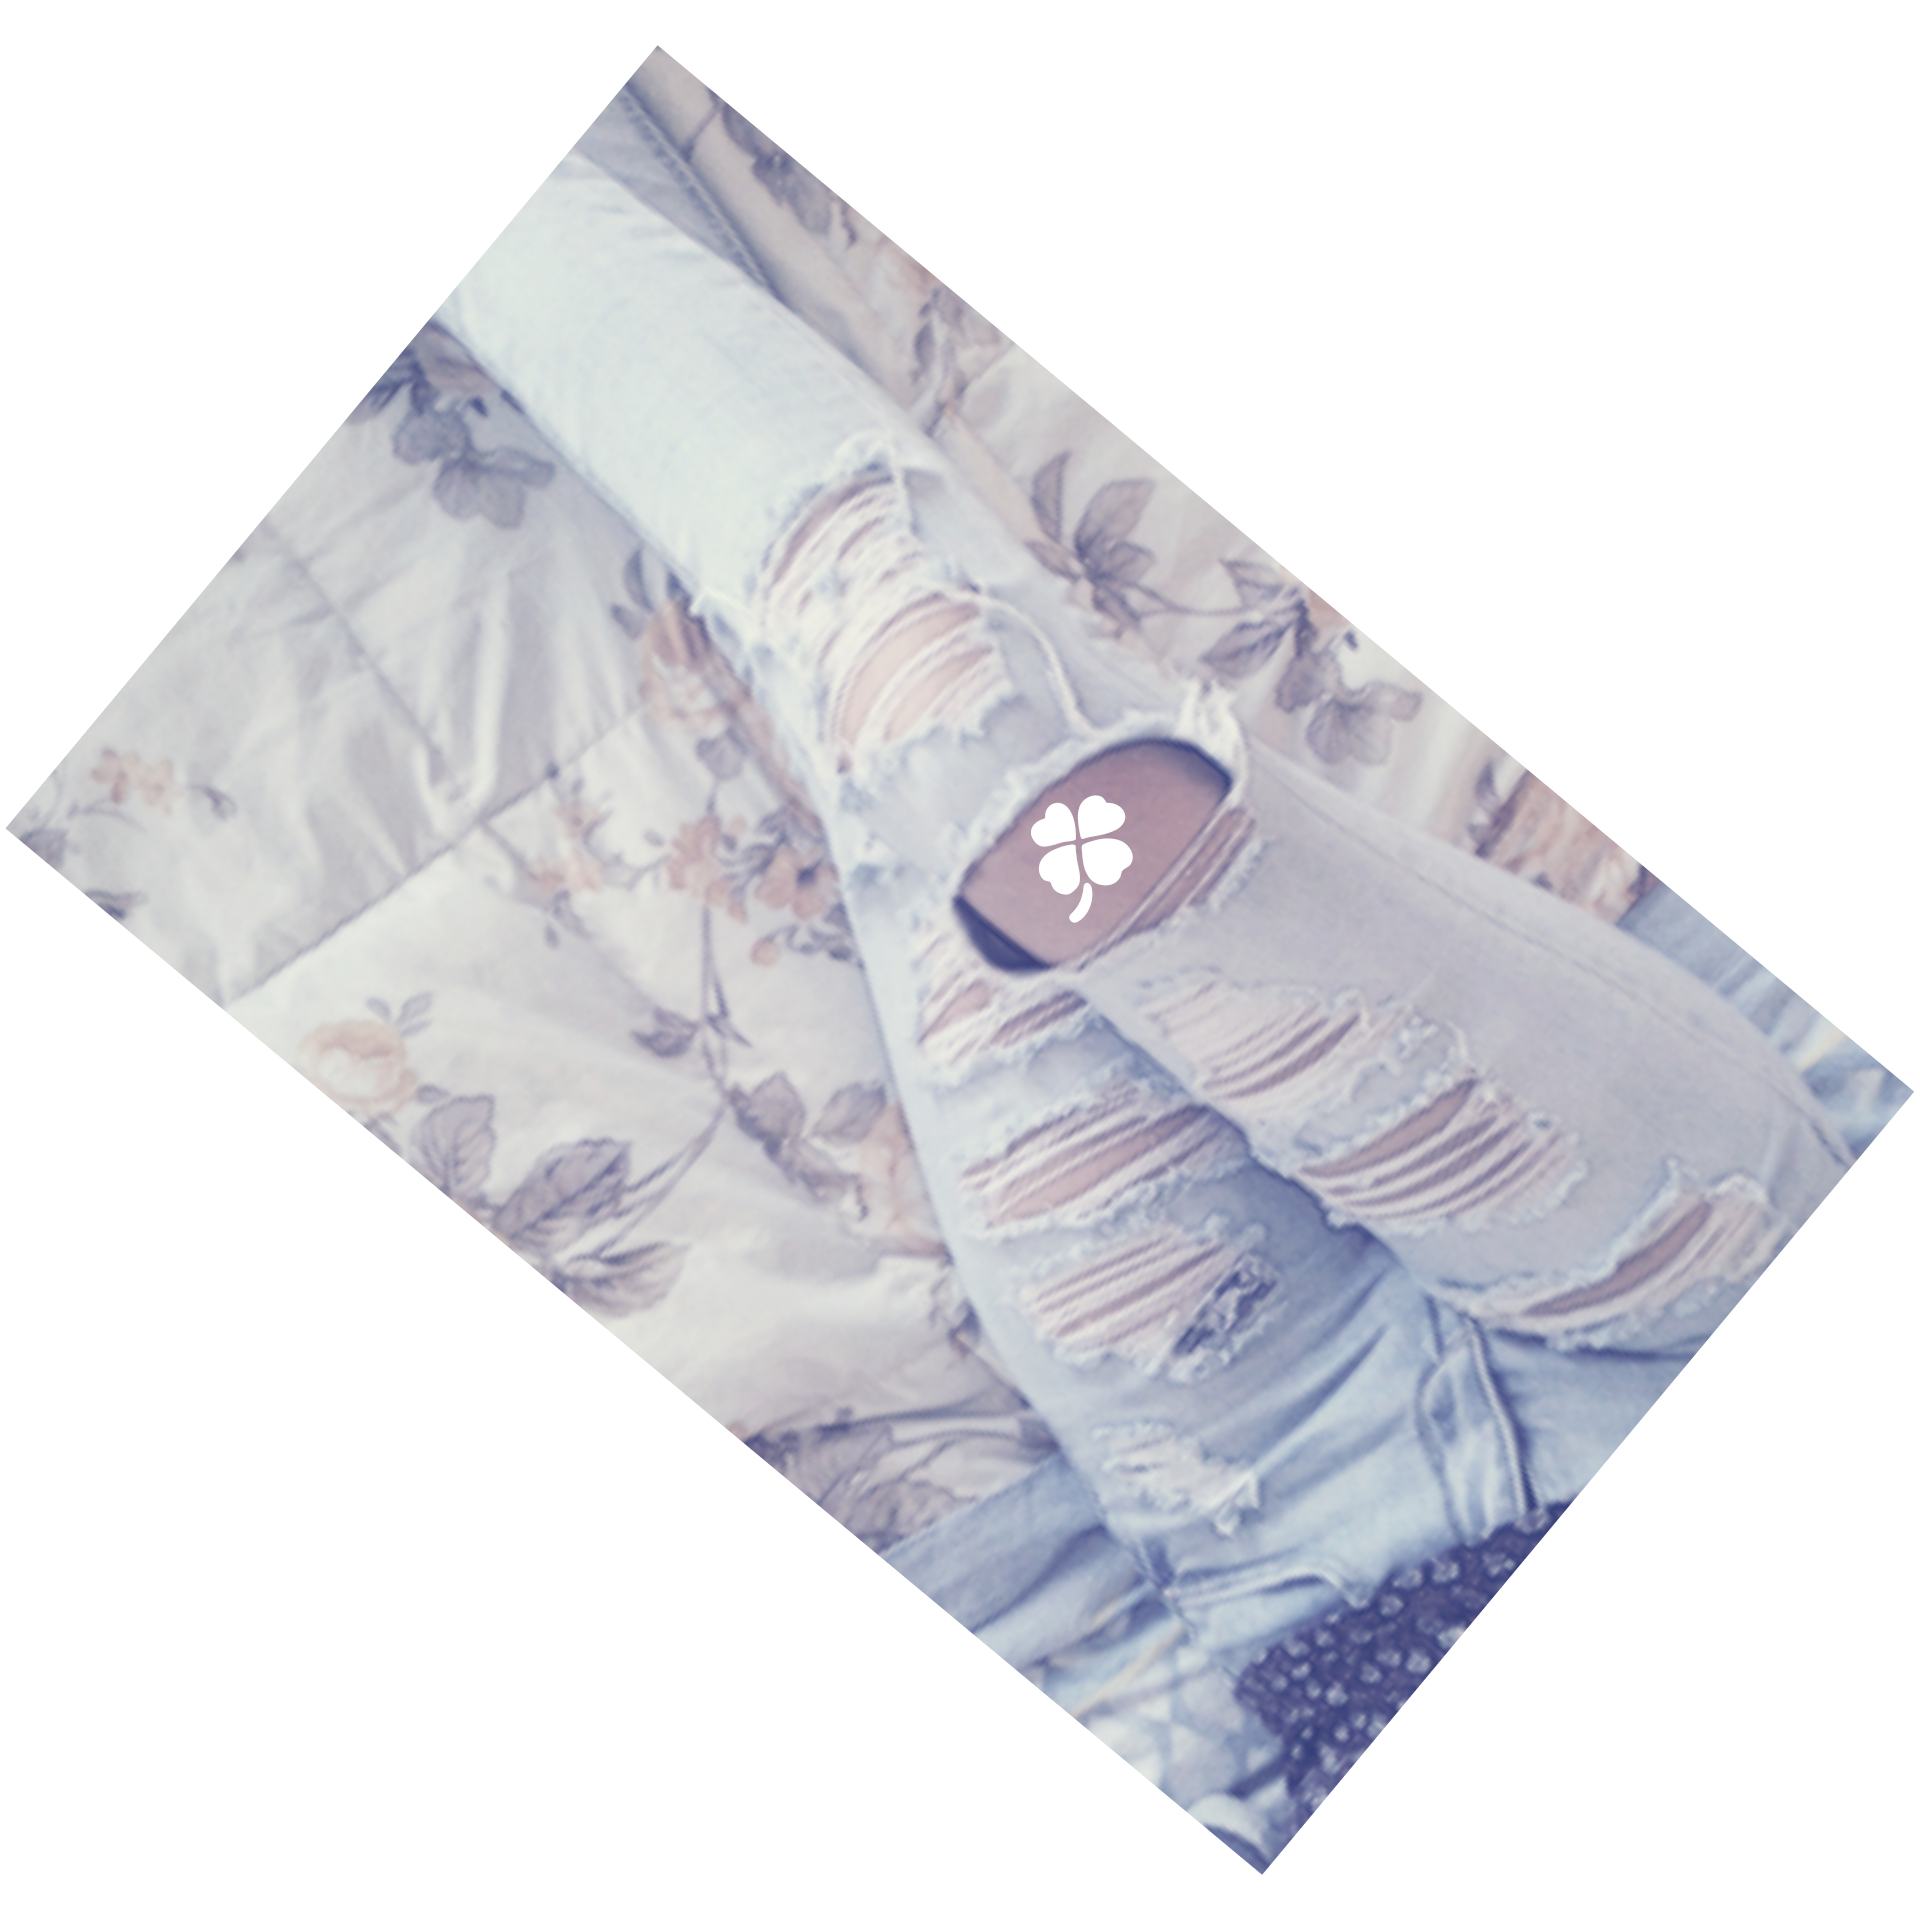 annalisaangiulli's Cover Photo